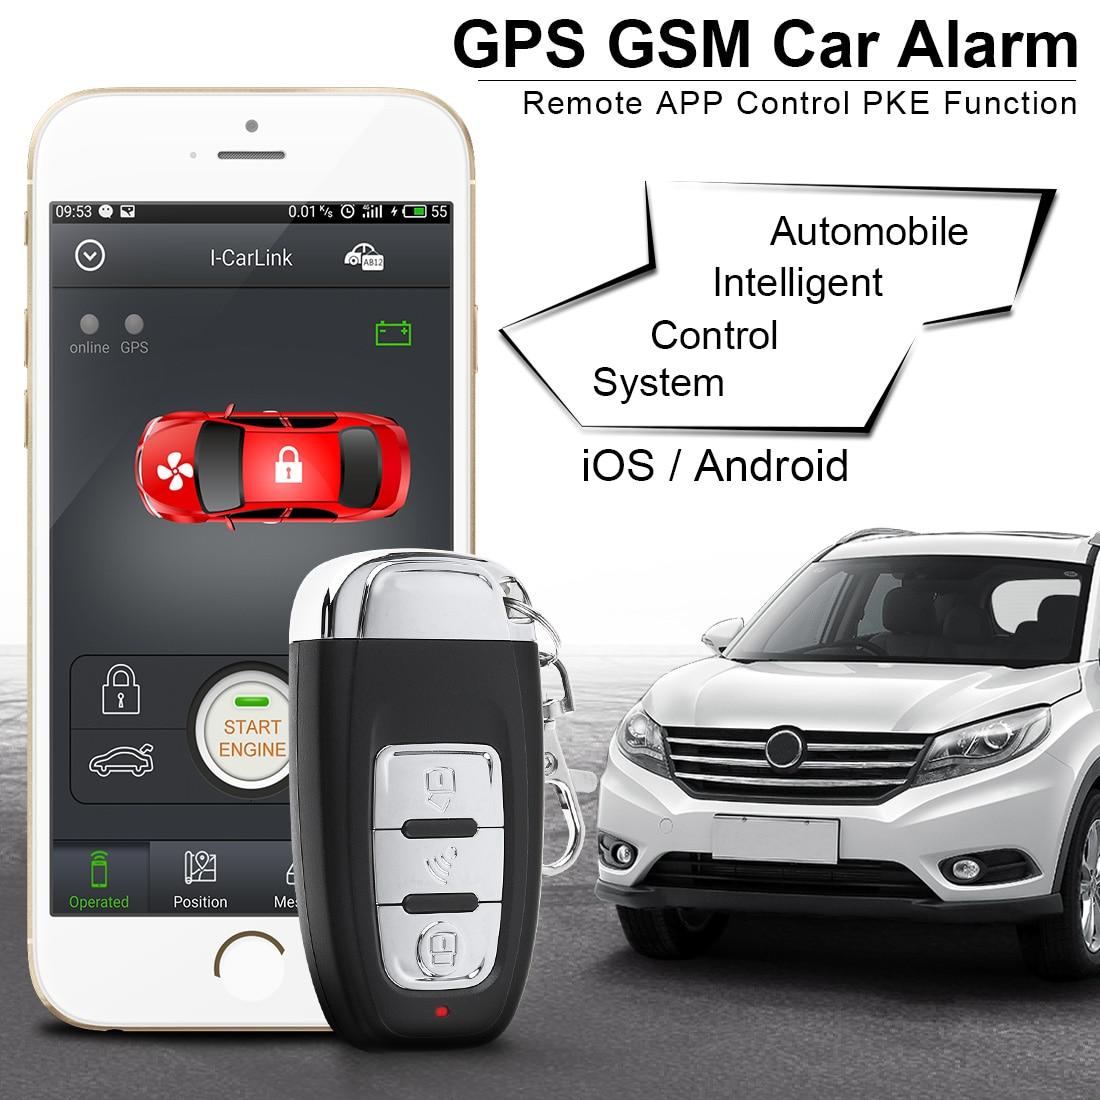 pke-smartphone-fontbstart-b-font-car-fontbsmart-b-font-alarm-remote-fontbstart-b-font-stop-engine-in